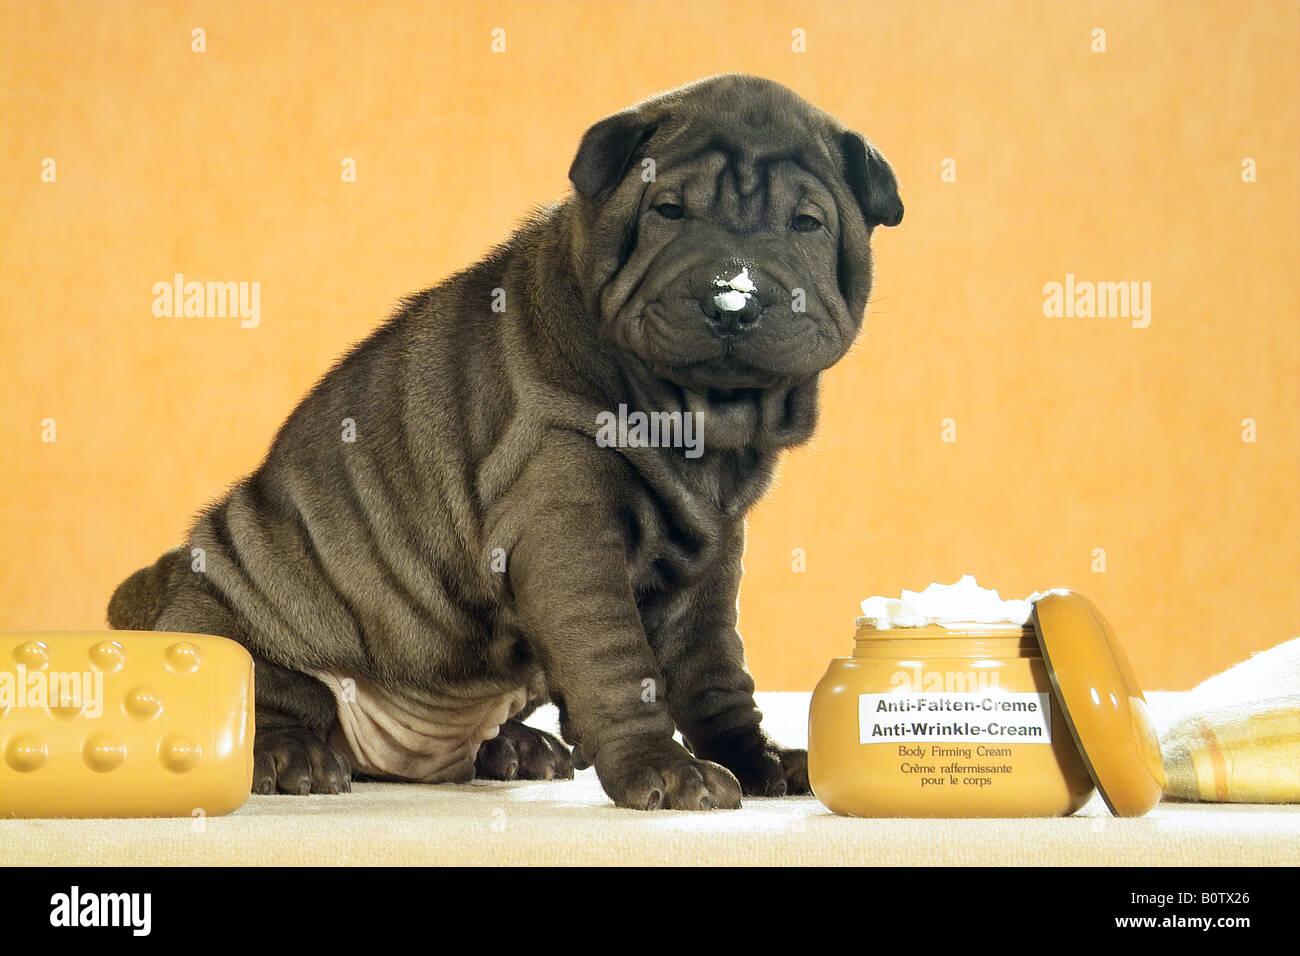 Shar Pei next to cream - Stock Image